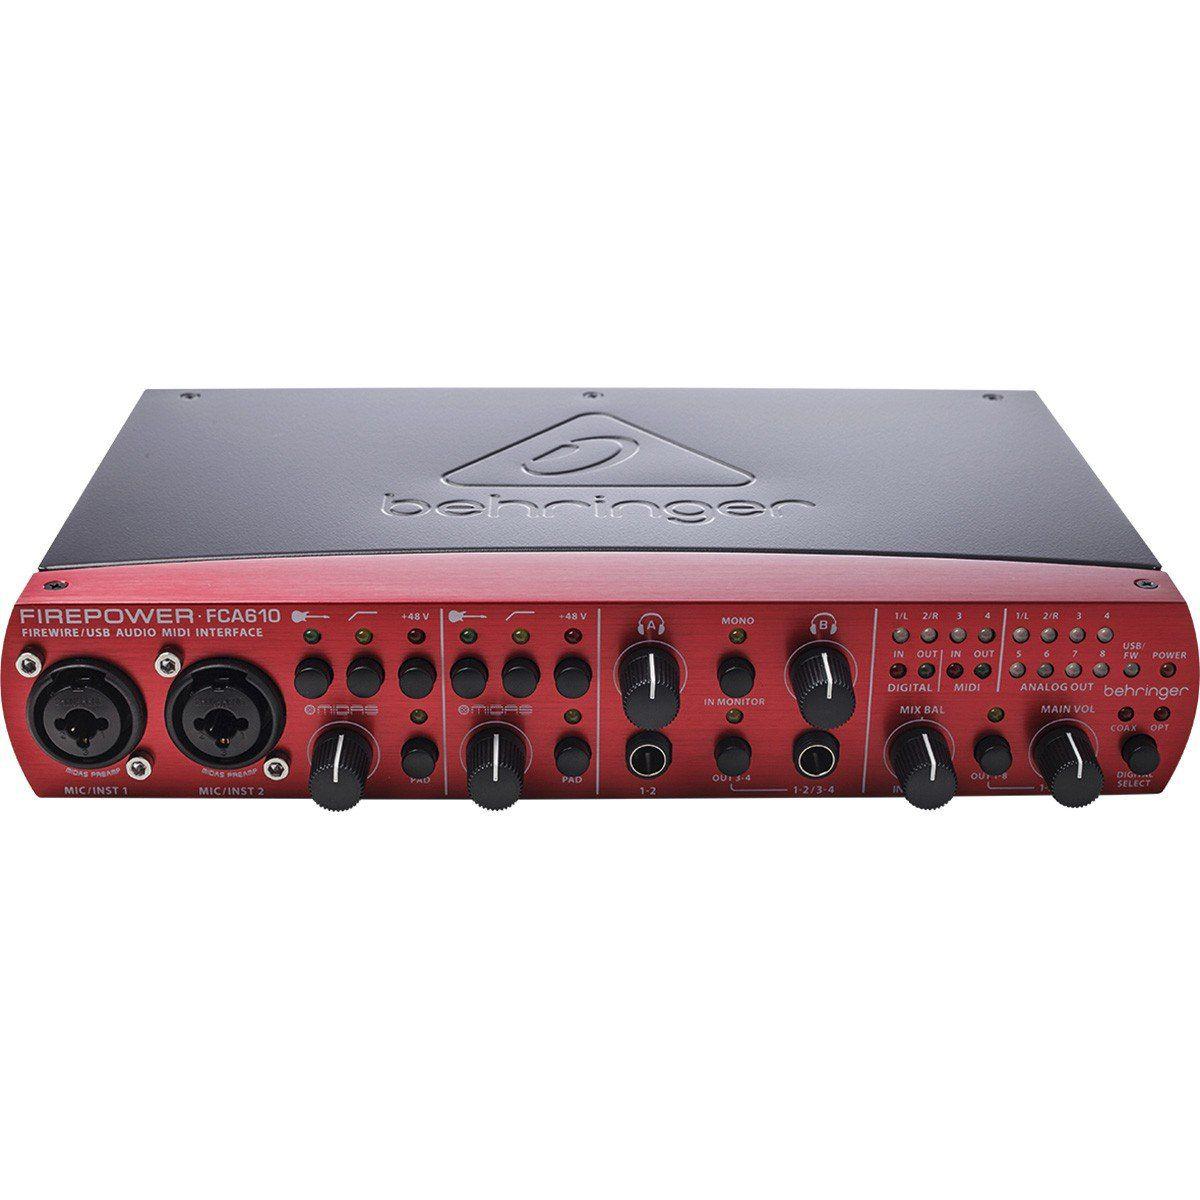 Behringer FCA610 FirePower Interface de Áudio FCA 610 6x10 MIDI FireWire Usb